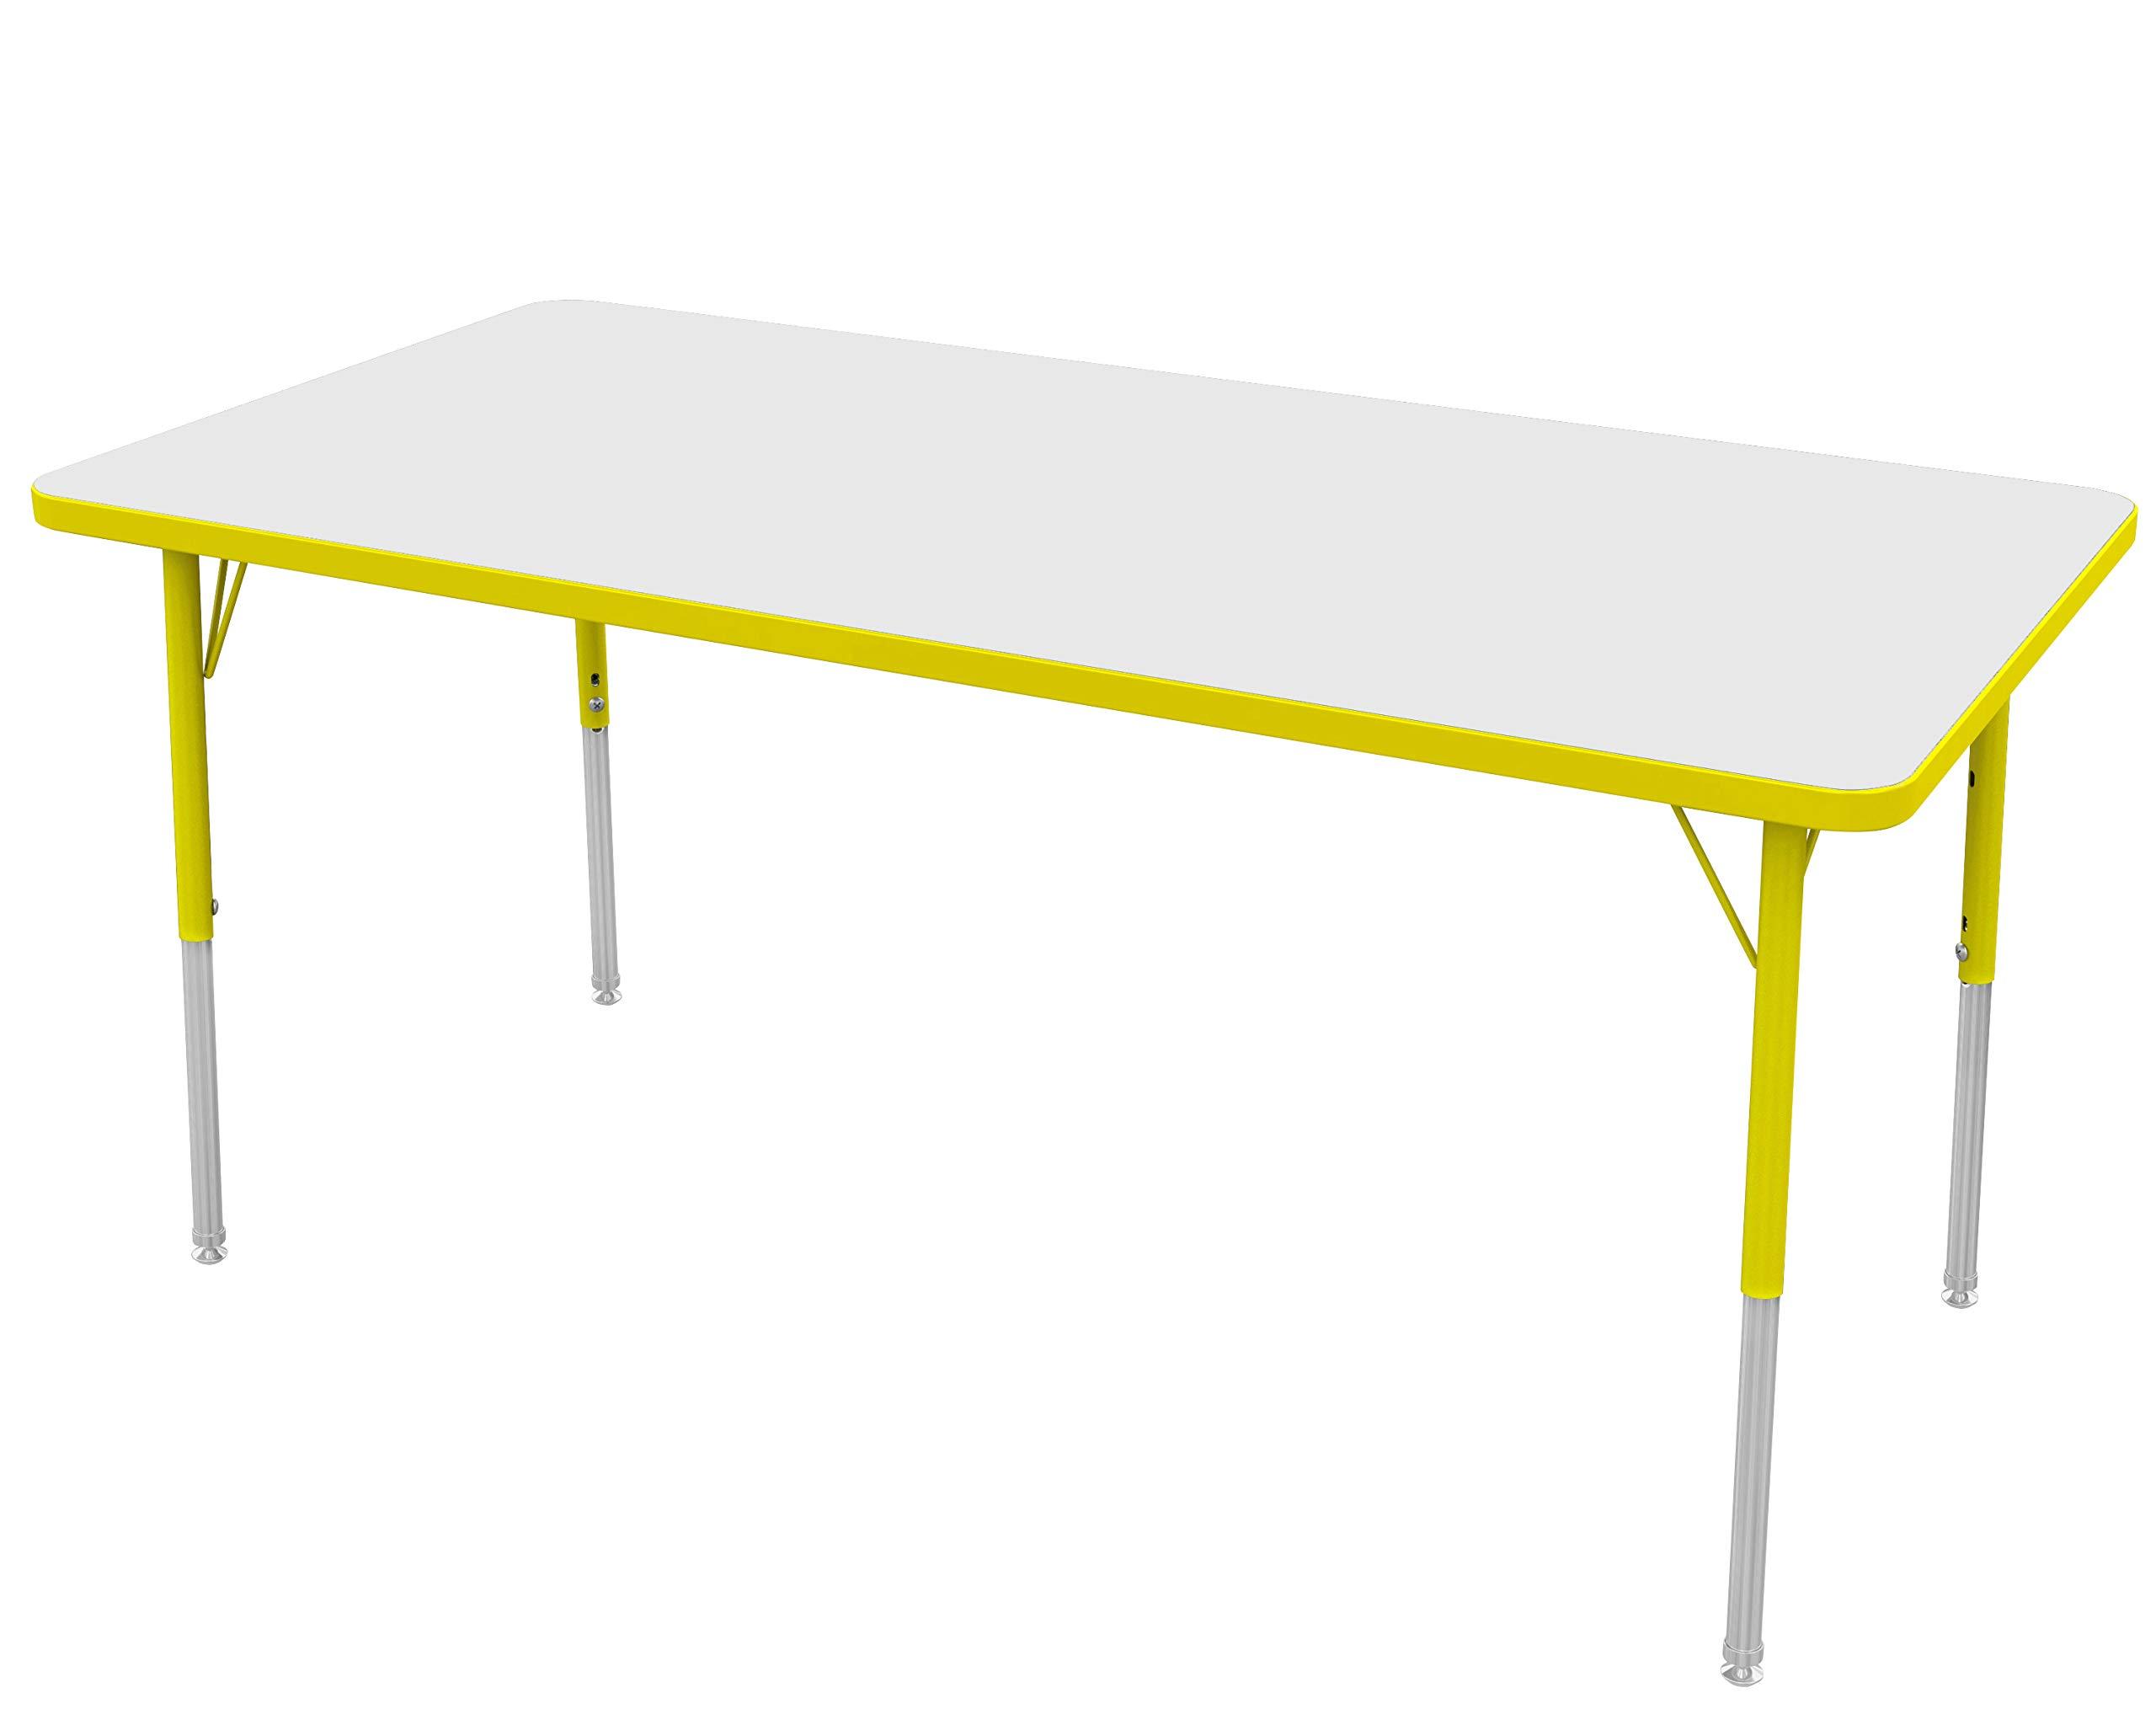 "Marco Group MGA2237-A9-AYEL 30"" x 60"" Rectangular Adjustable Height Classroom Activity Tables (16""- 24"") Toddler Size, Dry Erase-Top, Yellow-Edge, Yellow Leg"